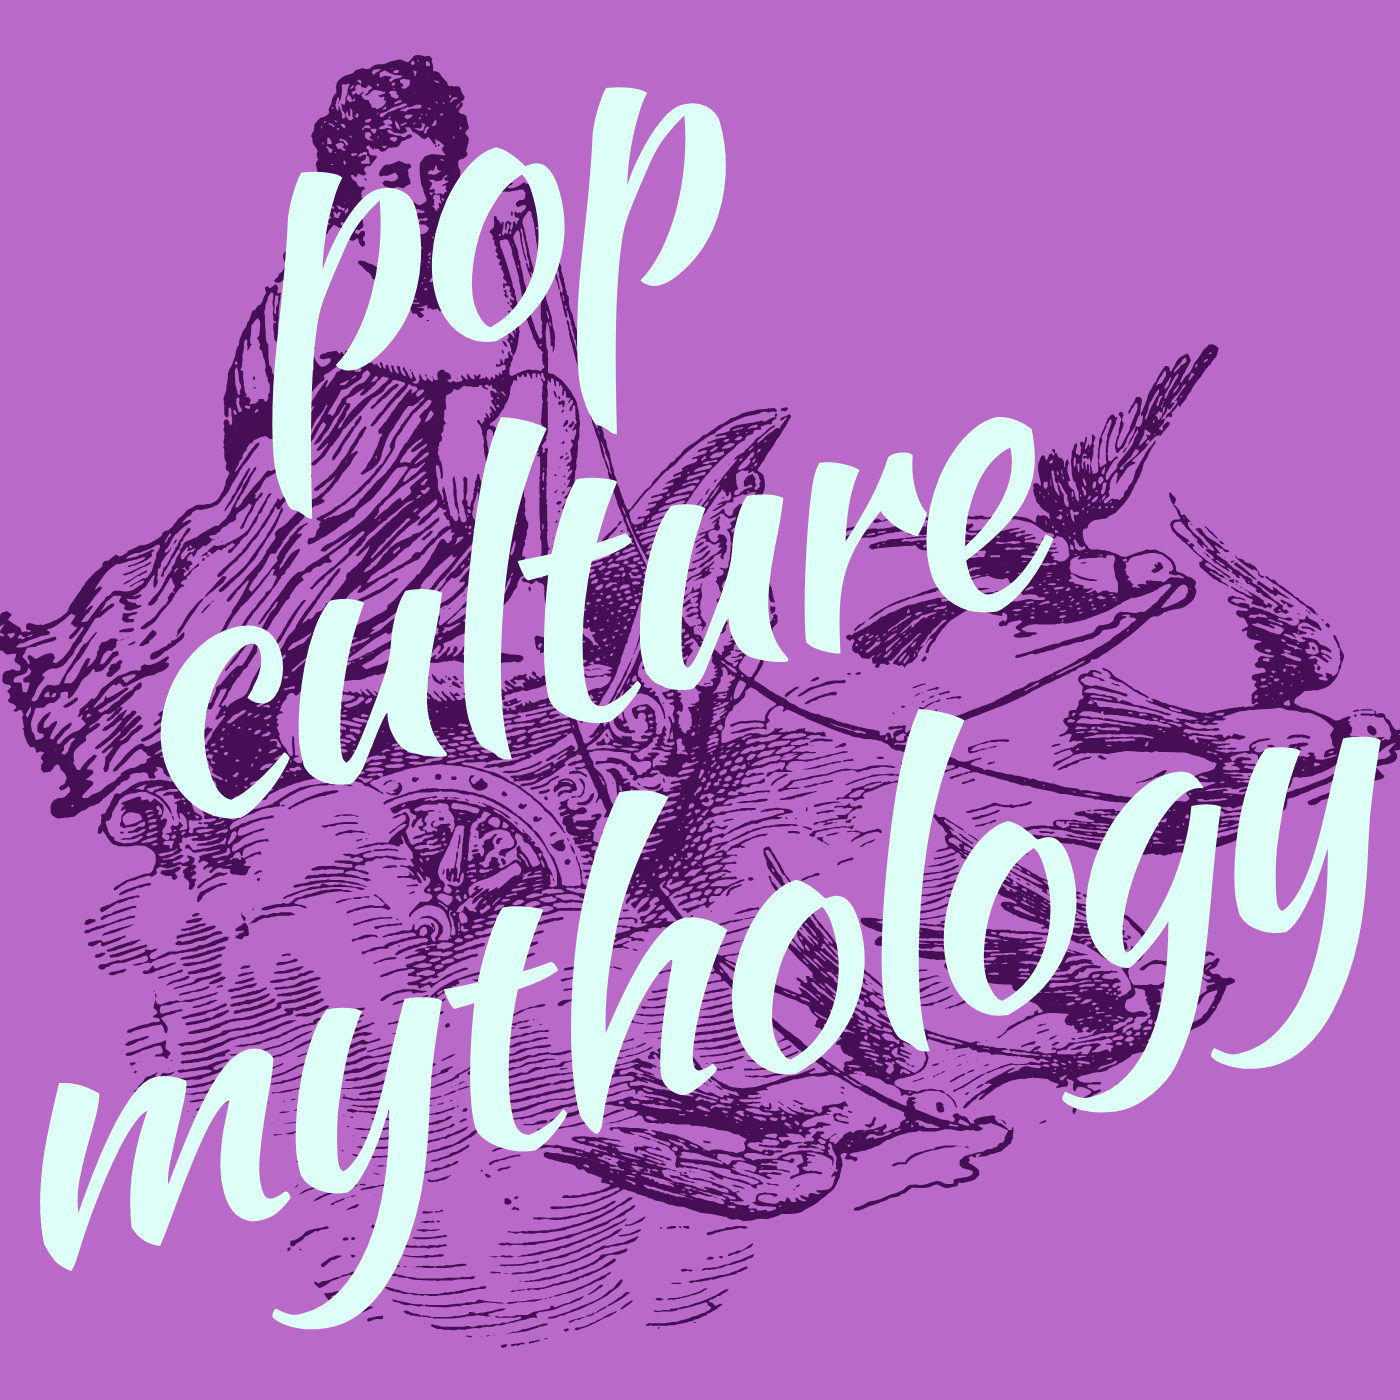 Pop culture mythology (1).png